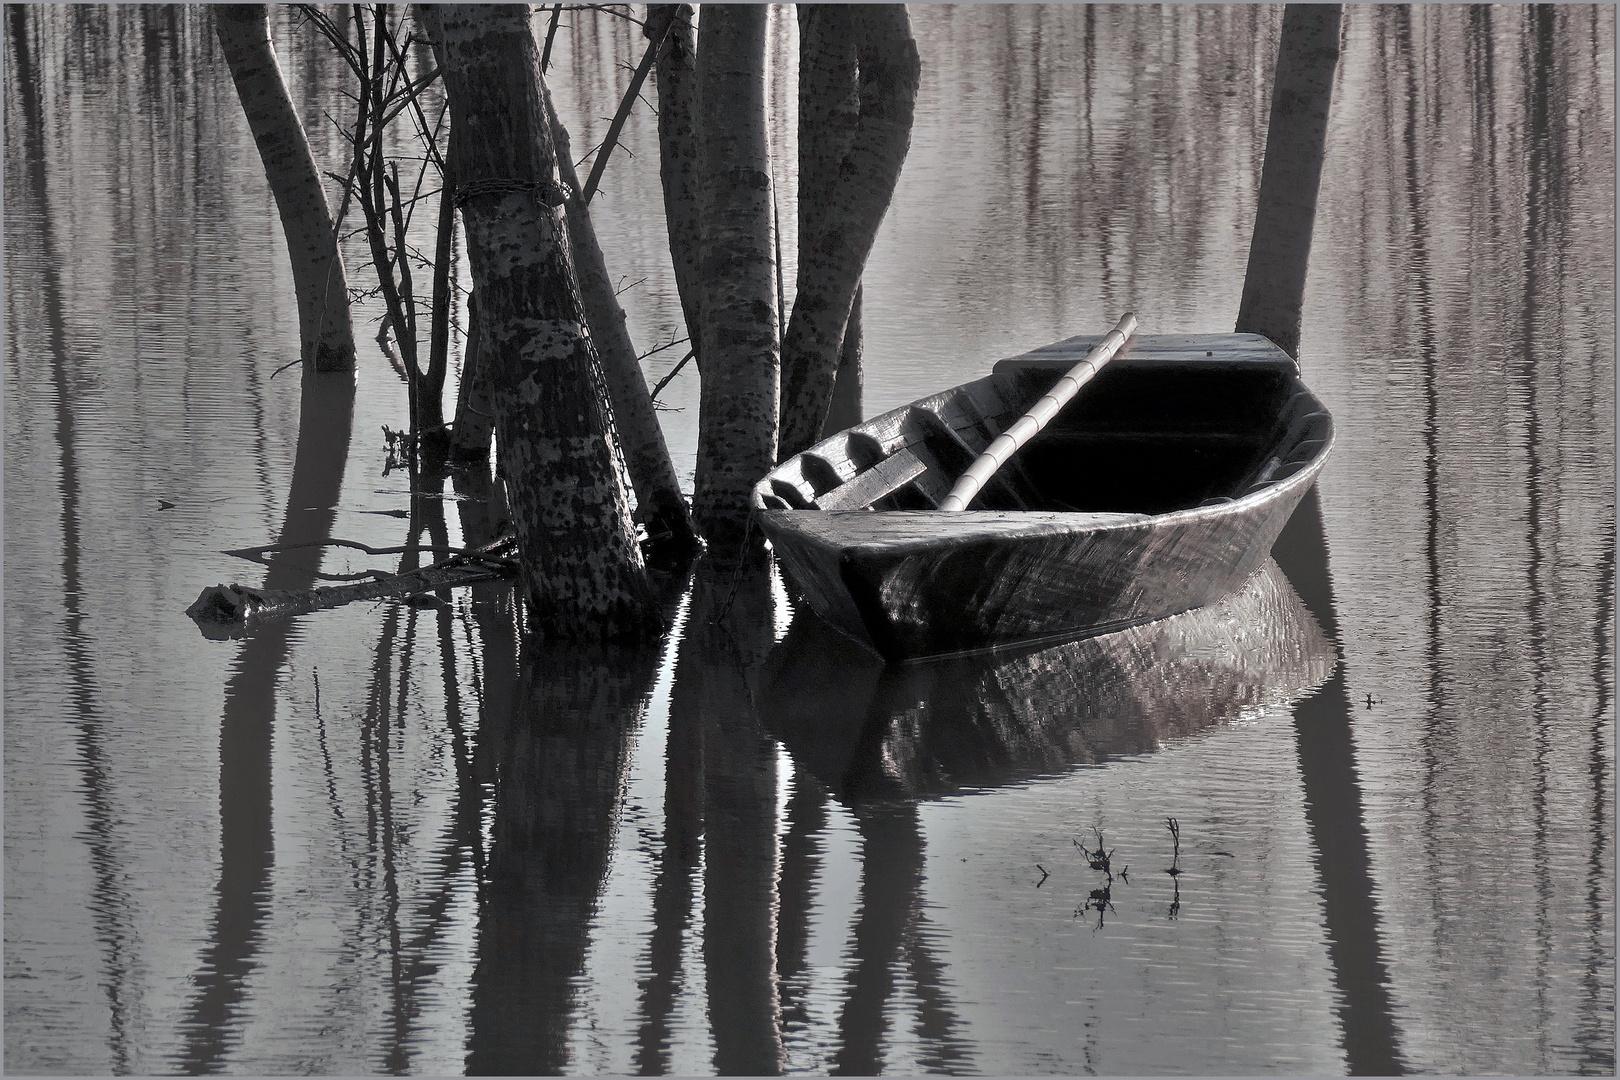 inondation au marais .....